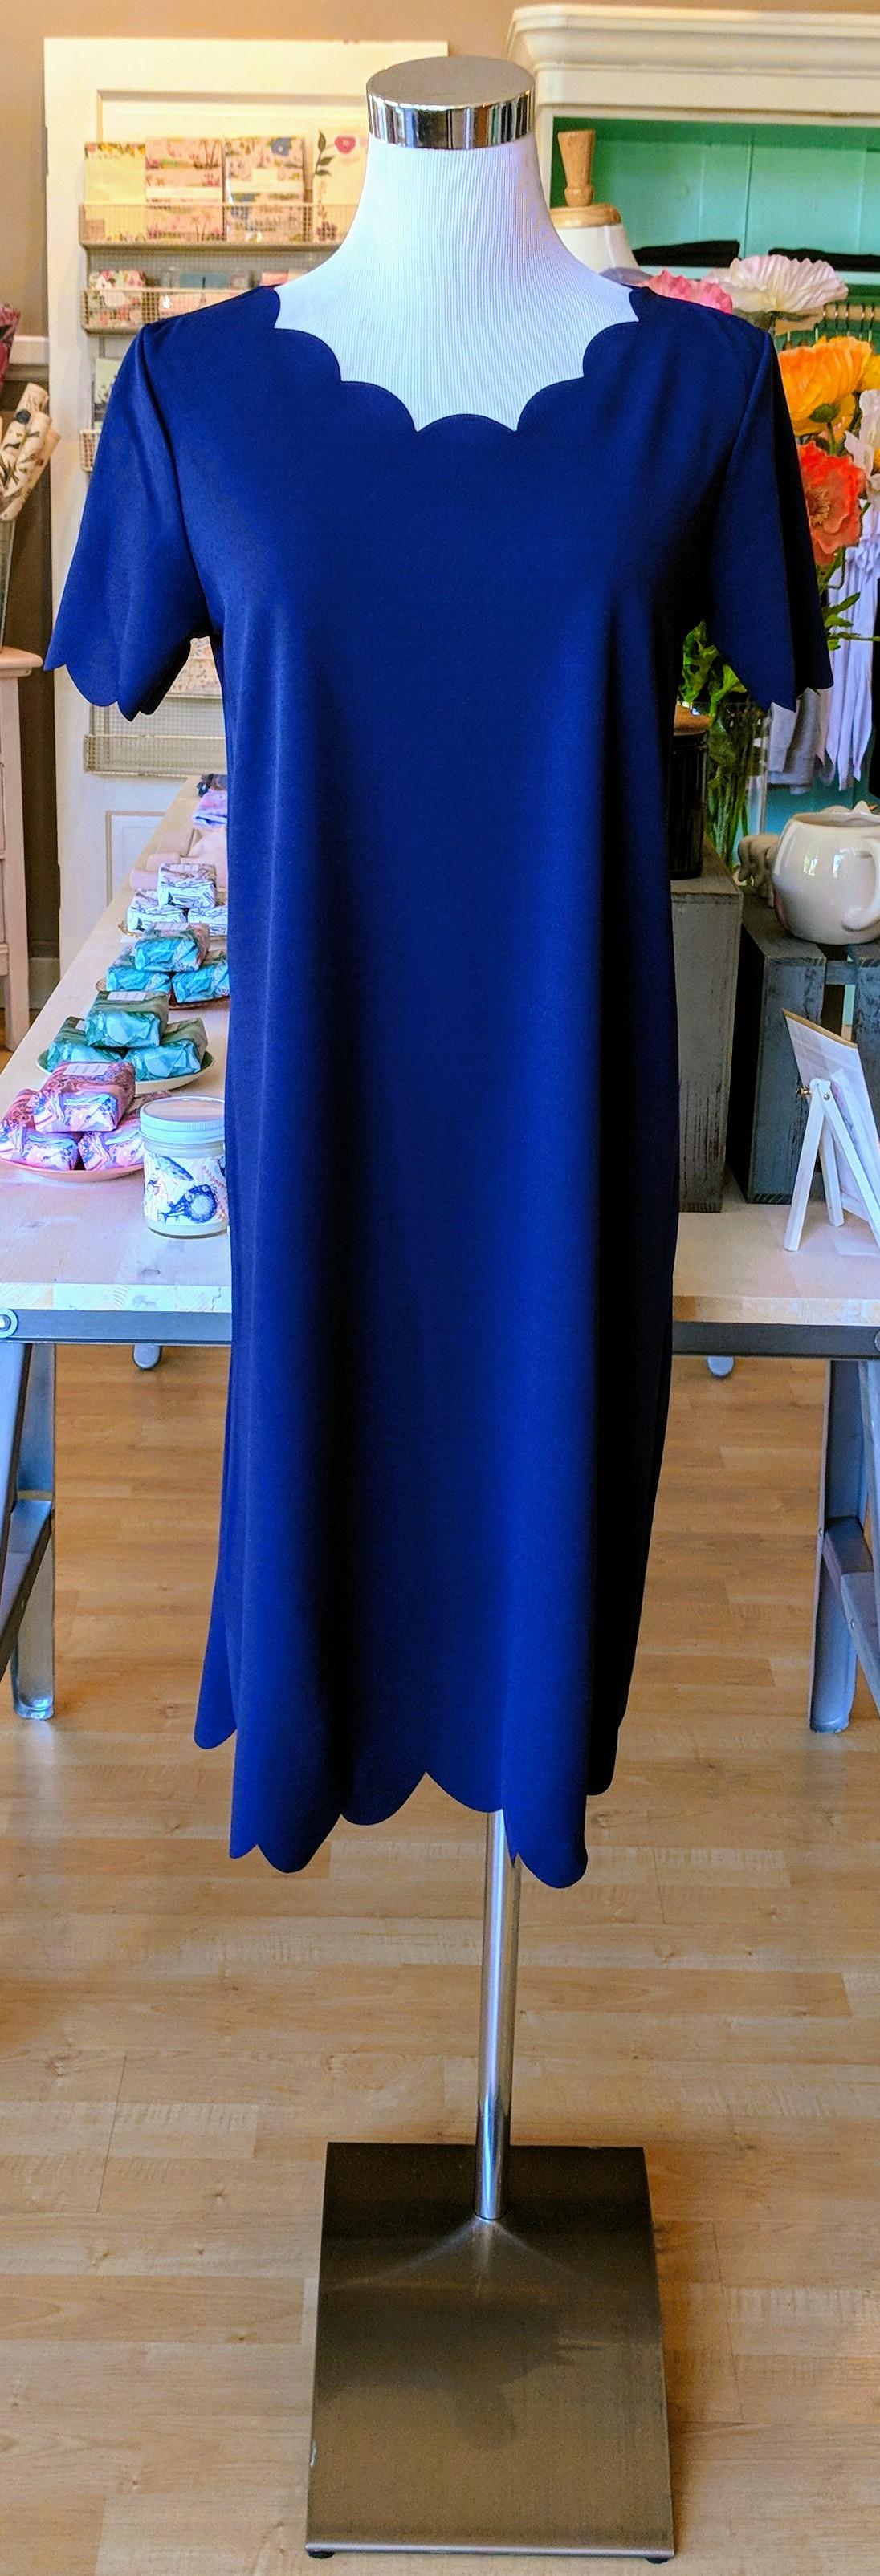 Navy dress with scallop hem